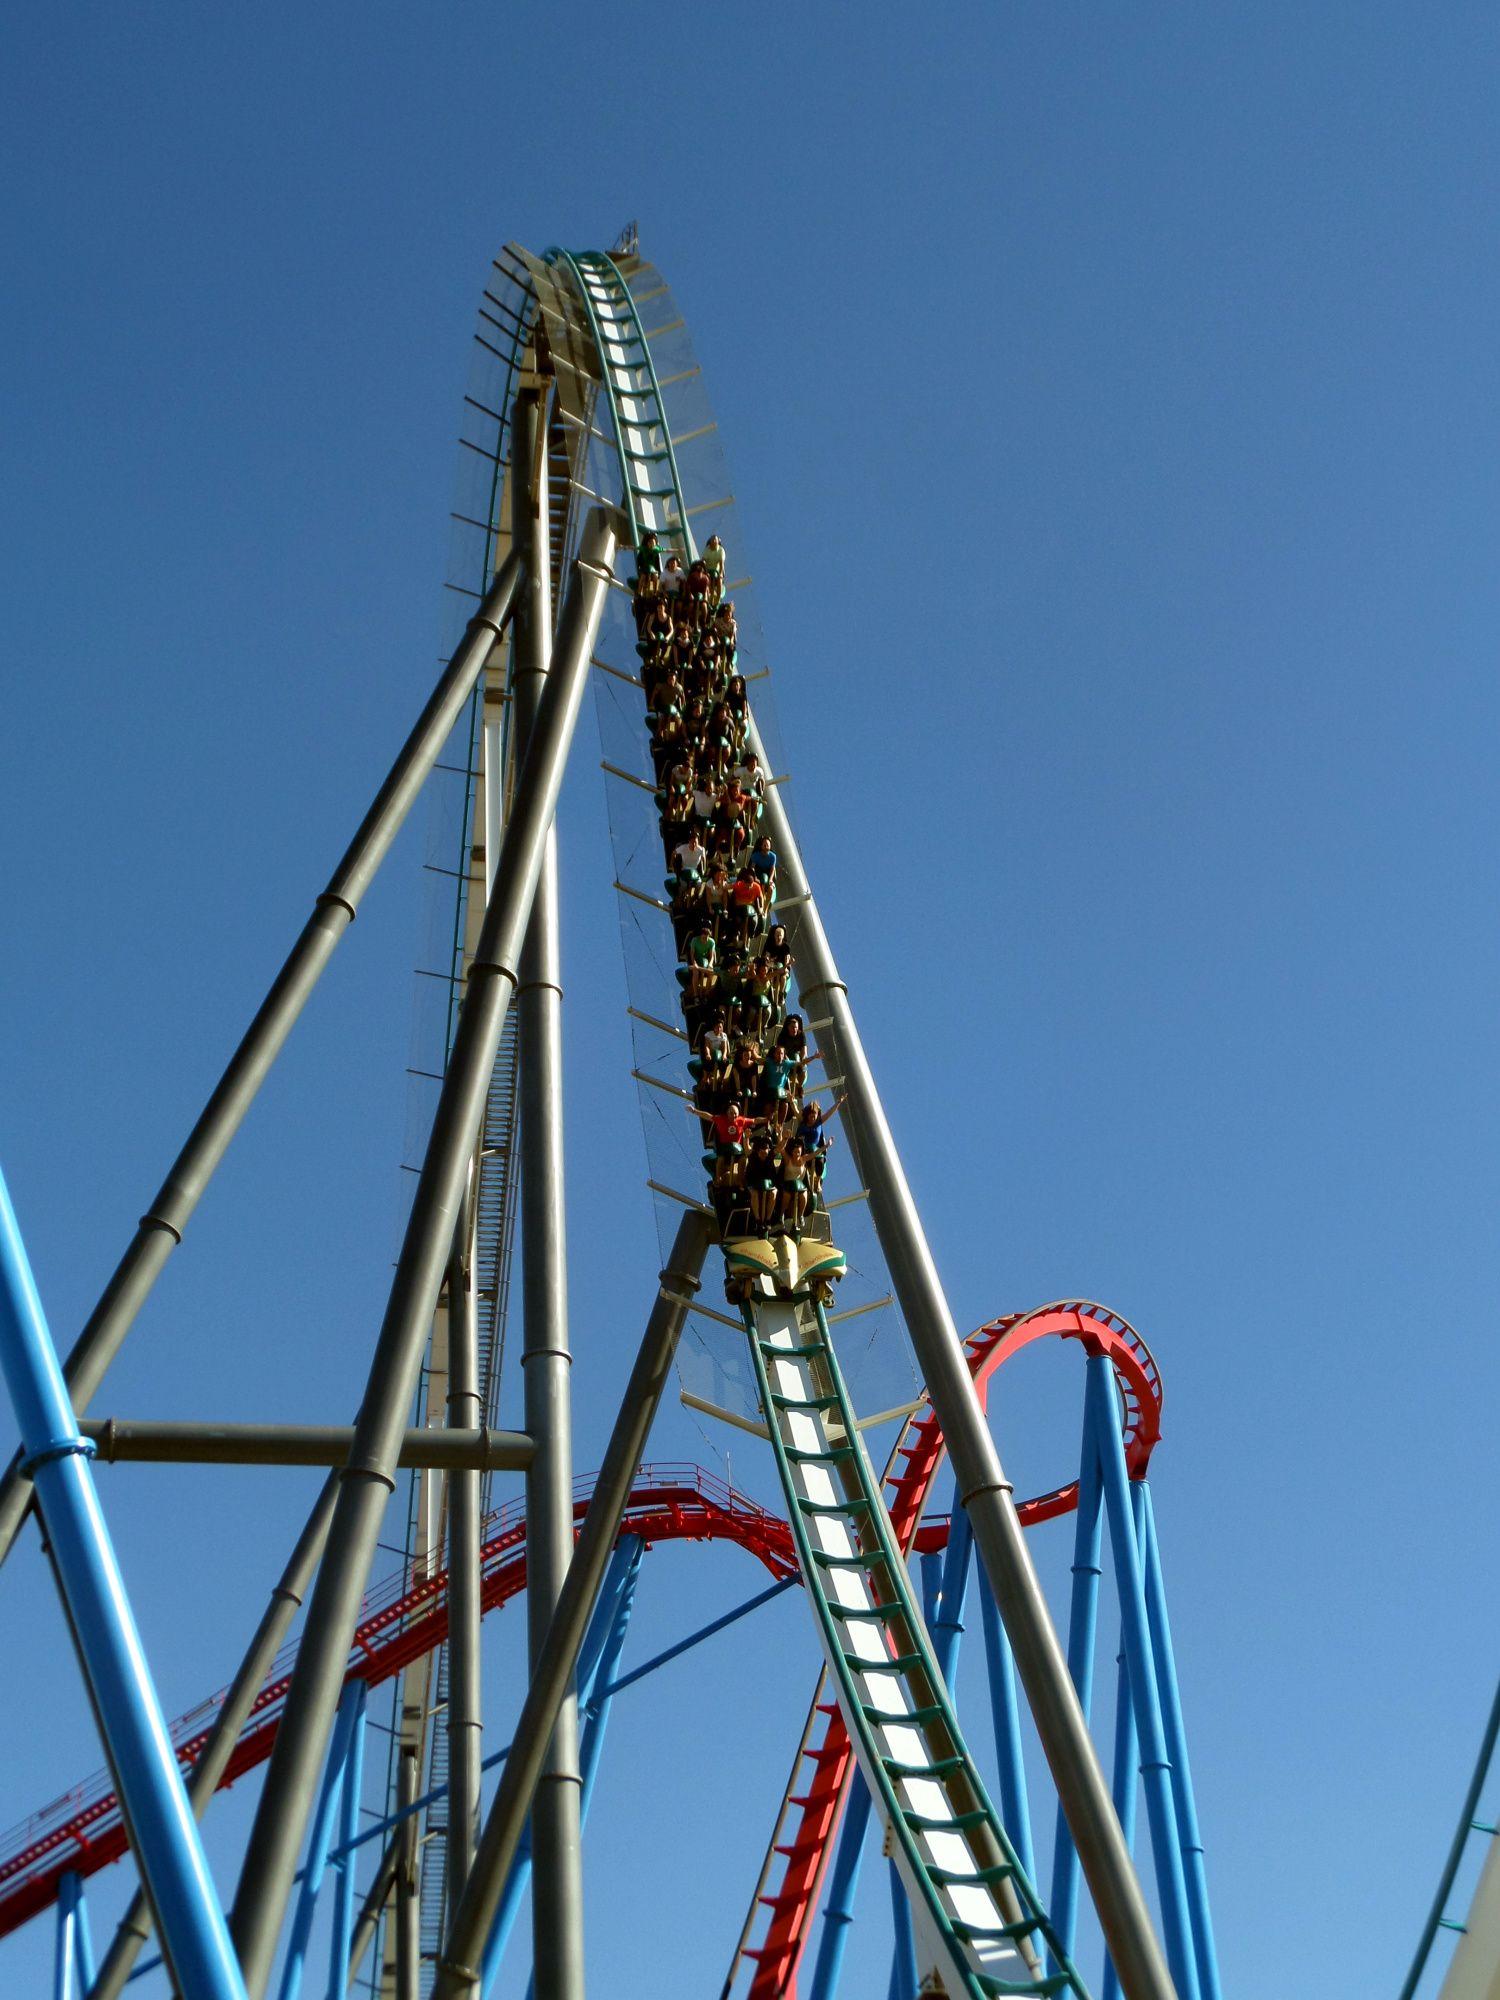 Shambala Port Aventura Spain 7 10 2013 Follow Us Www Themeparkguide Org Thrill Ride Roller Coaster Amusement Park